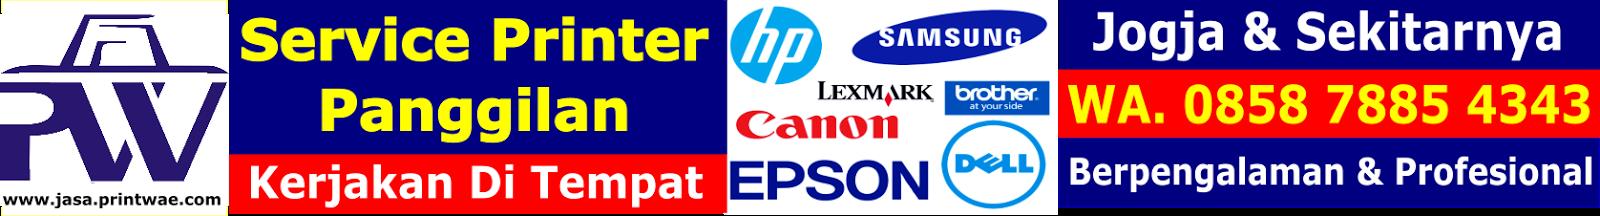 Jasa Teknisi Printer Panggilan | Service Printer Kerjakan Di Tempat Area Jogja